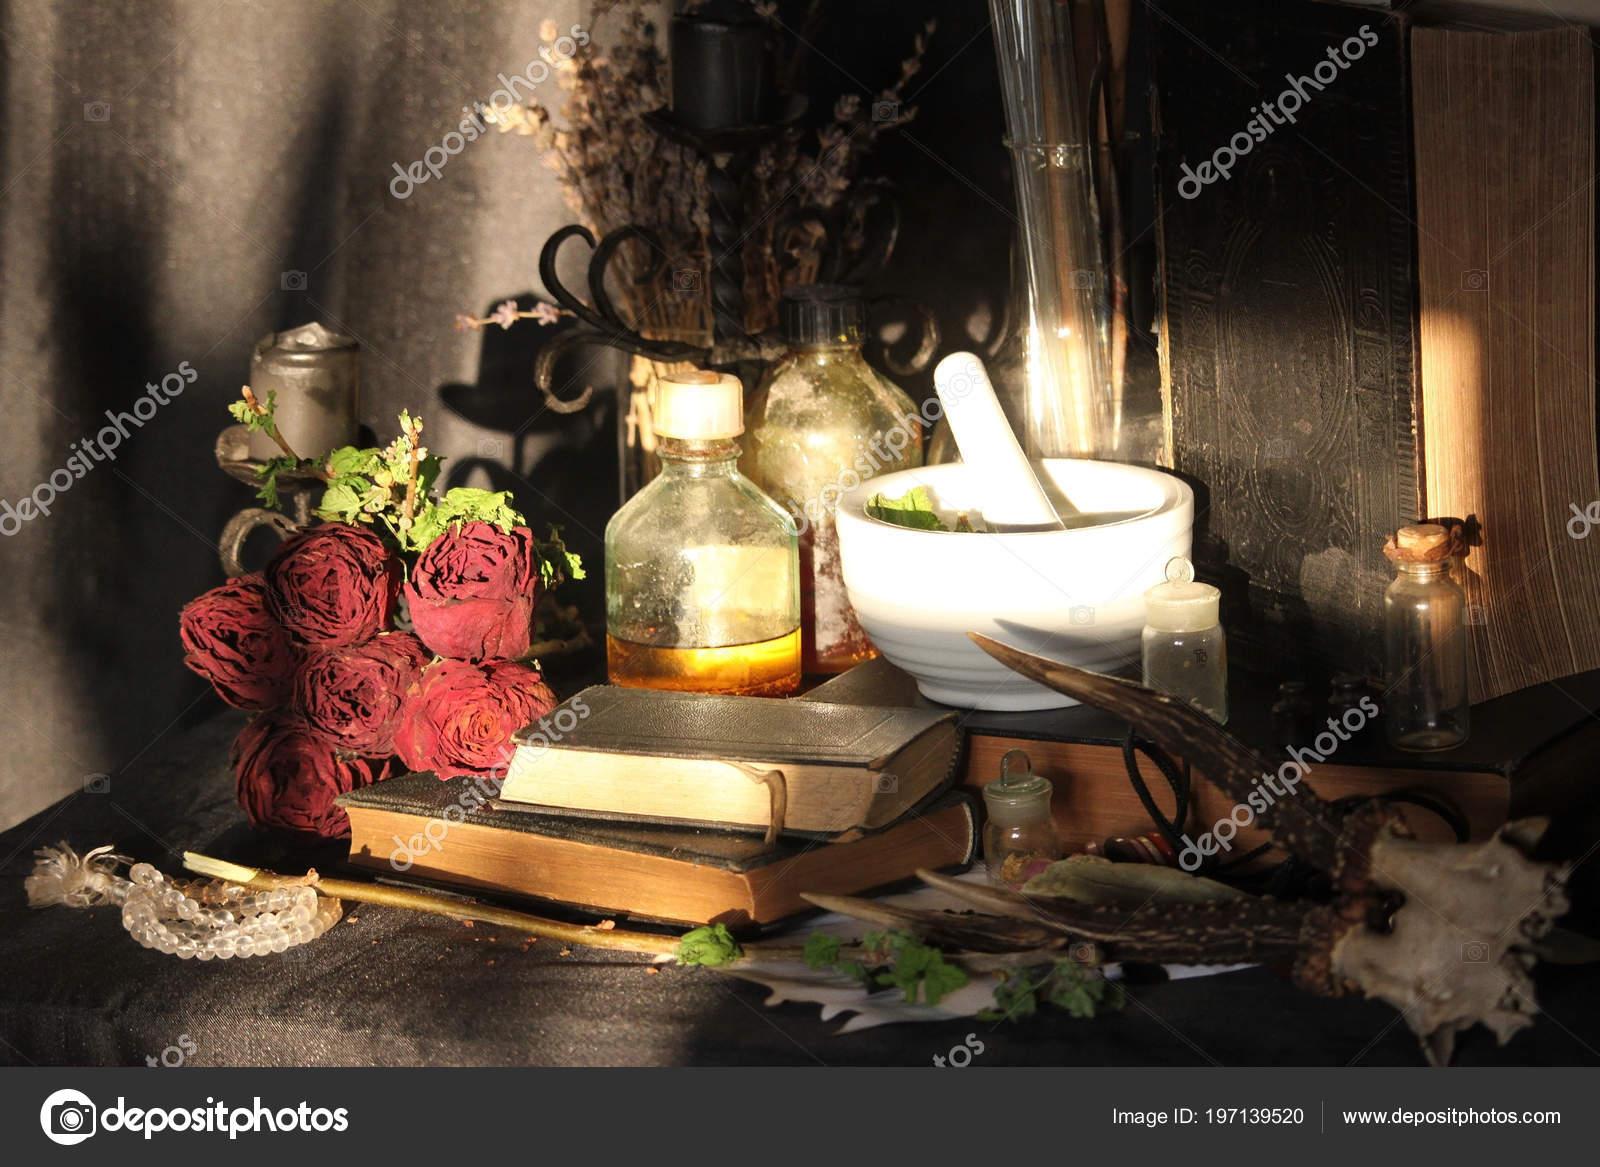 Black Magic Spells Wiccan Spells Herbs Still Live Old Oil